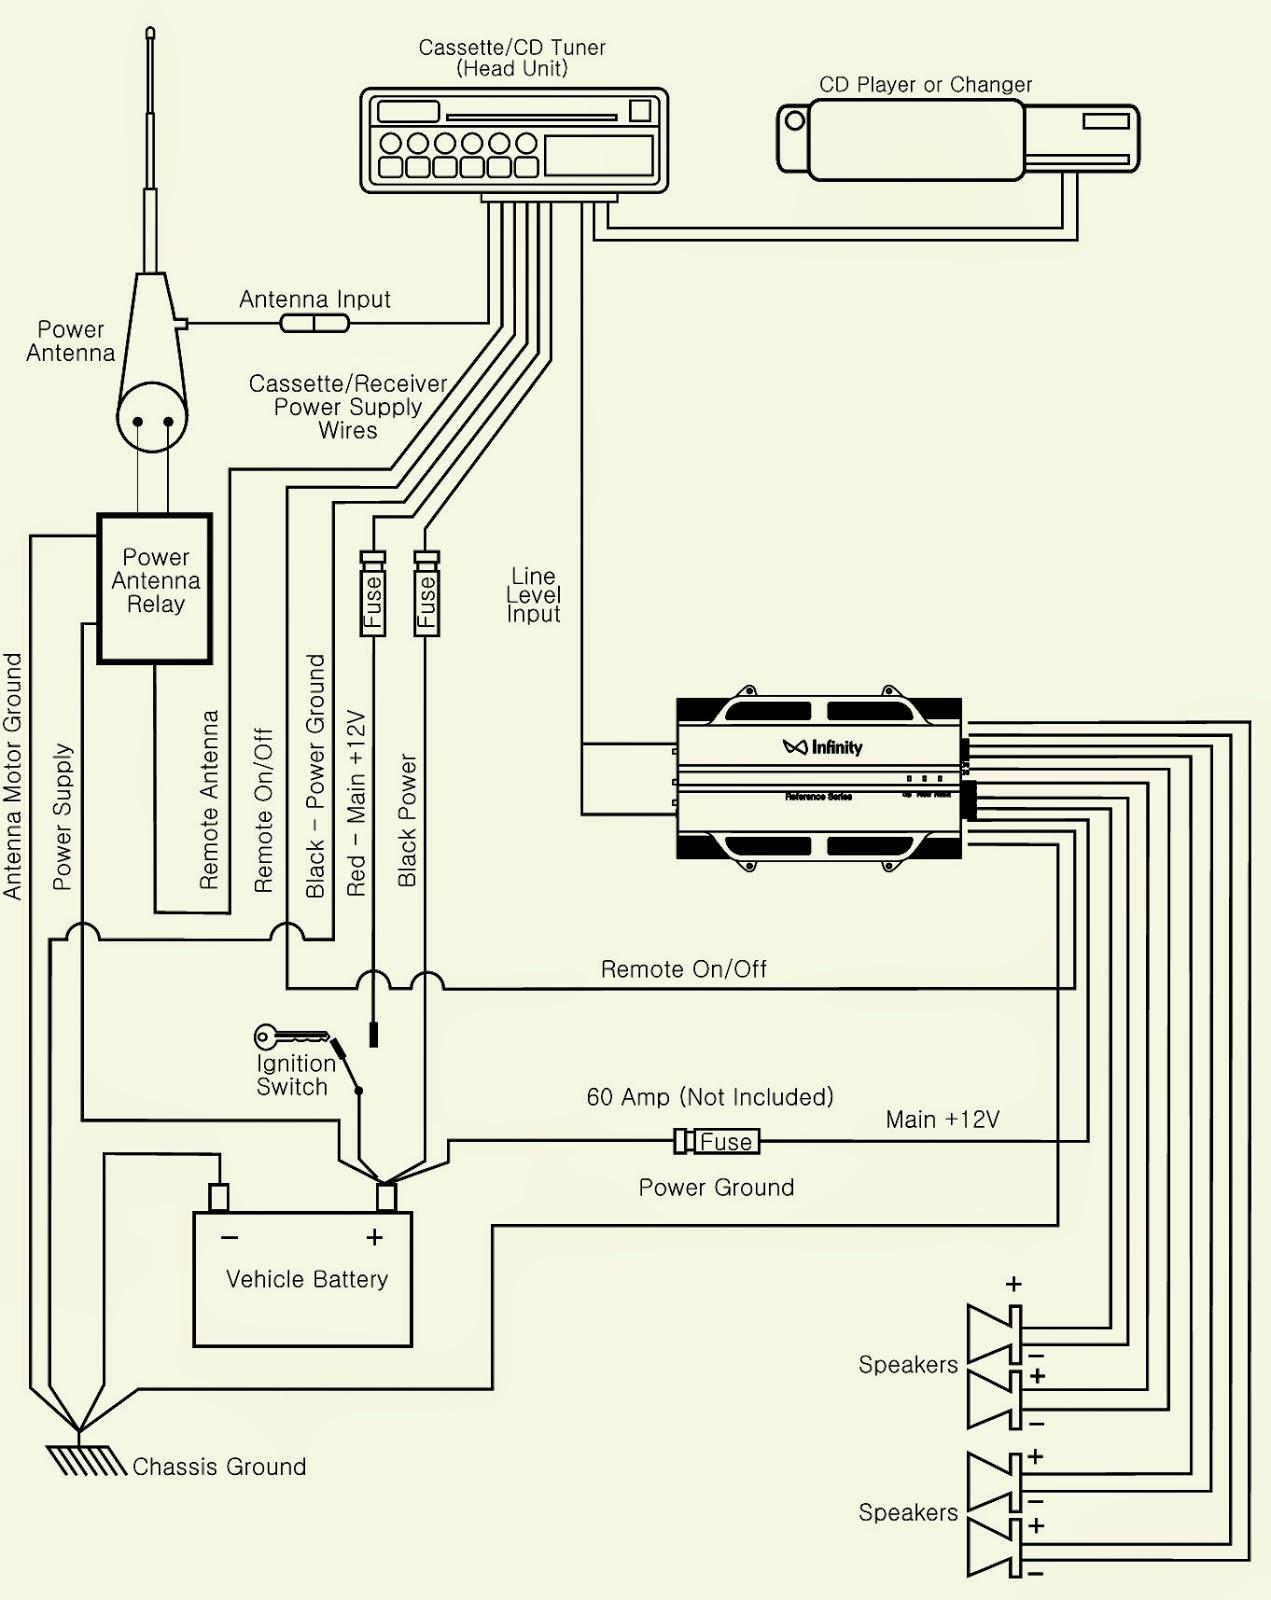 ribu1c wiring schematic c free printable wiring diagrams